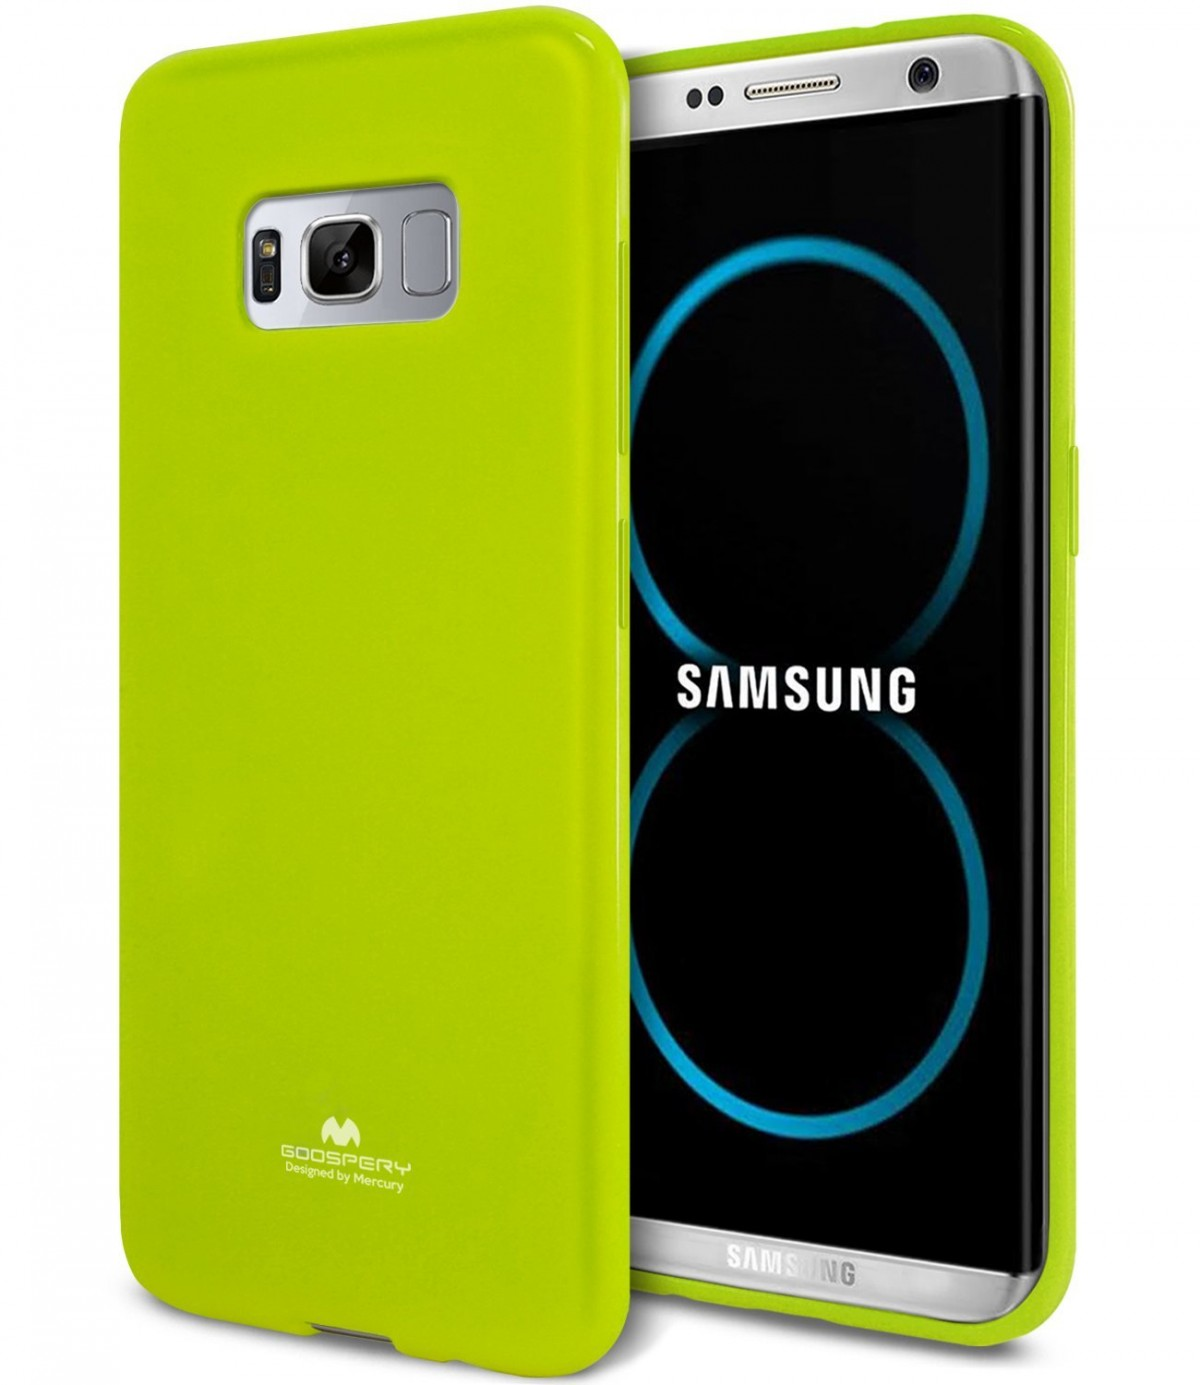 Silikonový obal / kryt/ pouzdro Goospery Mercury pro Samsung Galaxy S8+ (S8 Plus) - Jelly Case - Limetkový